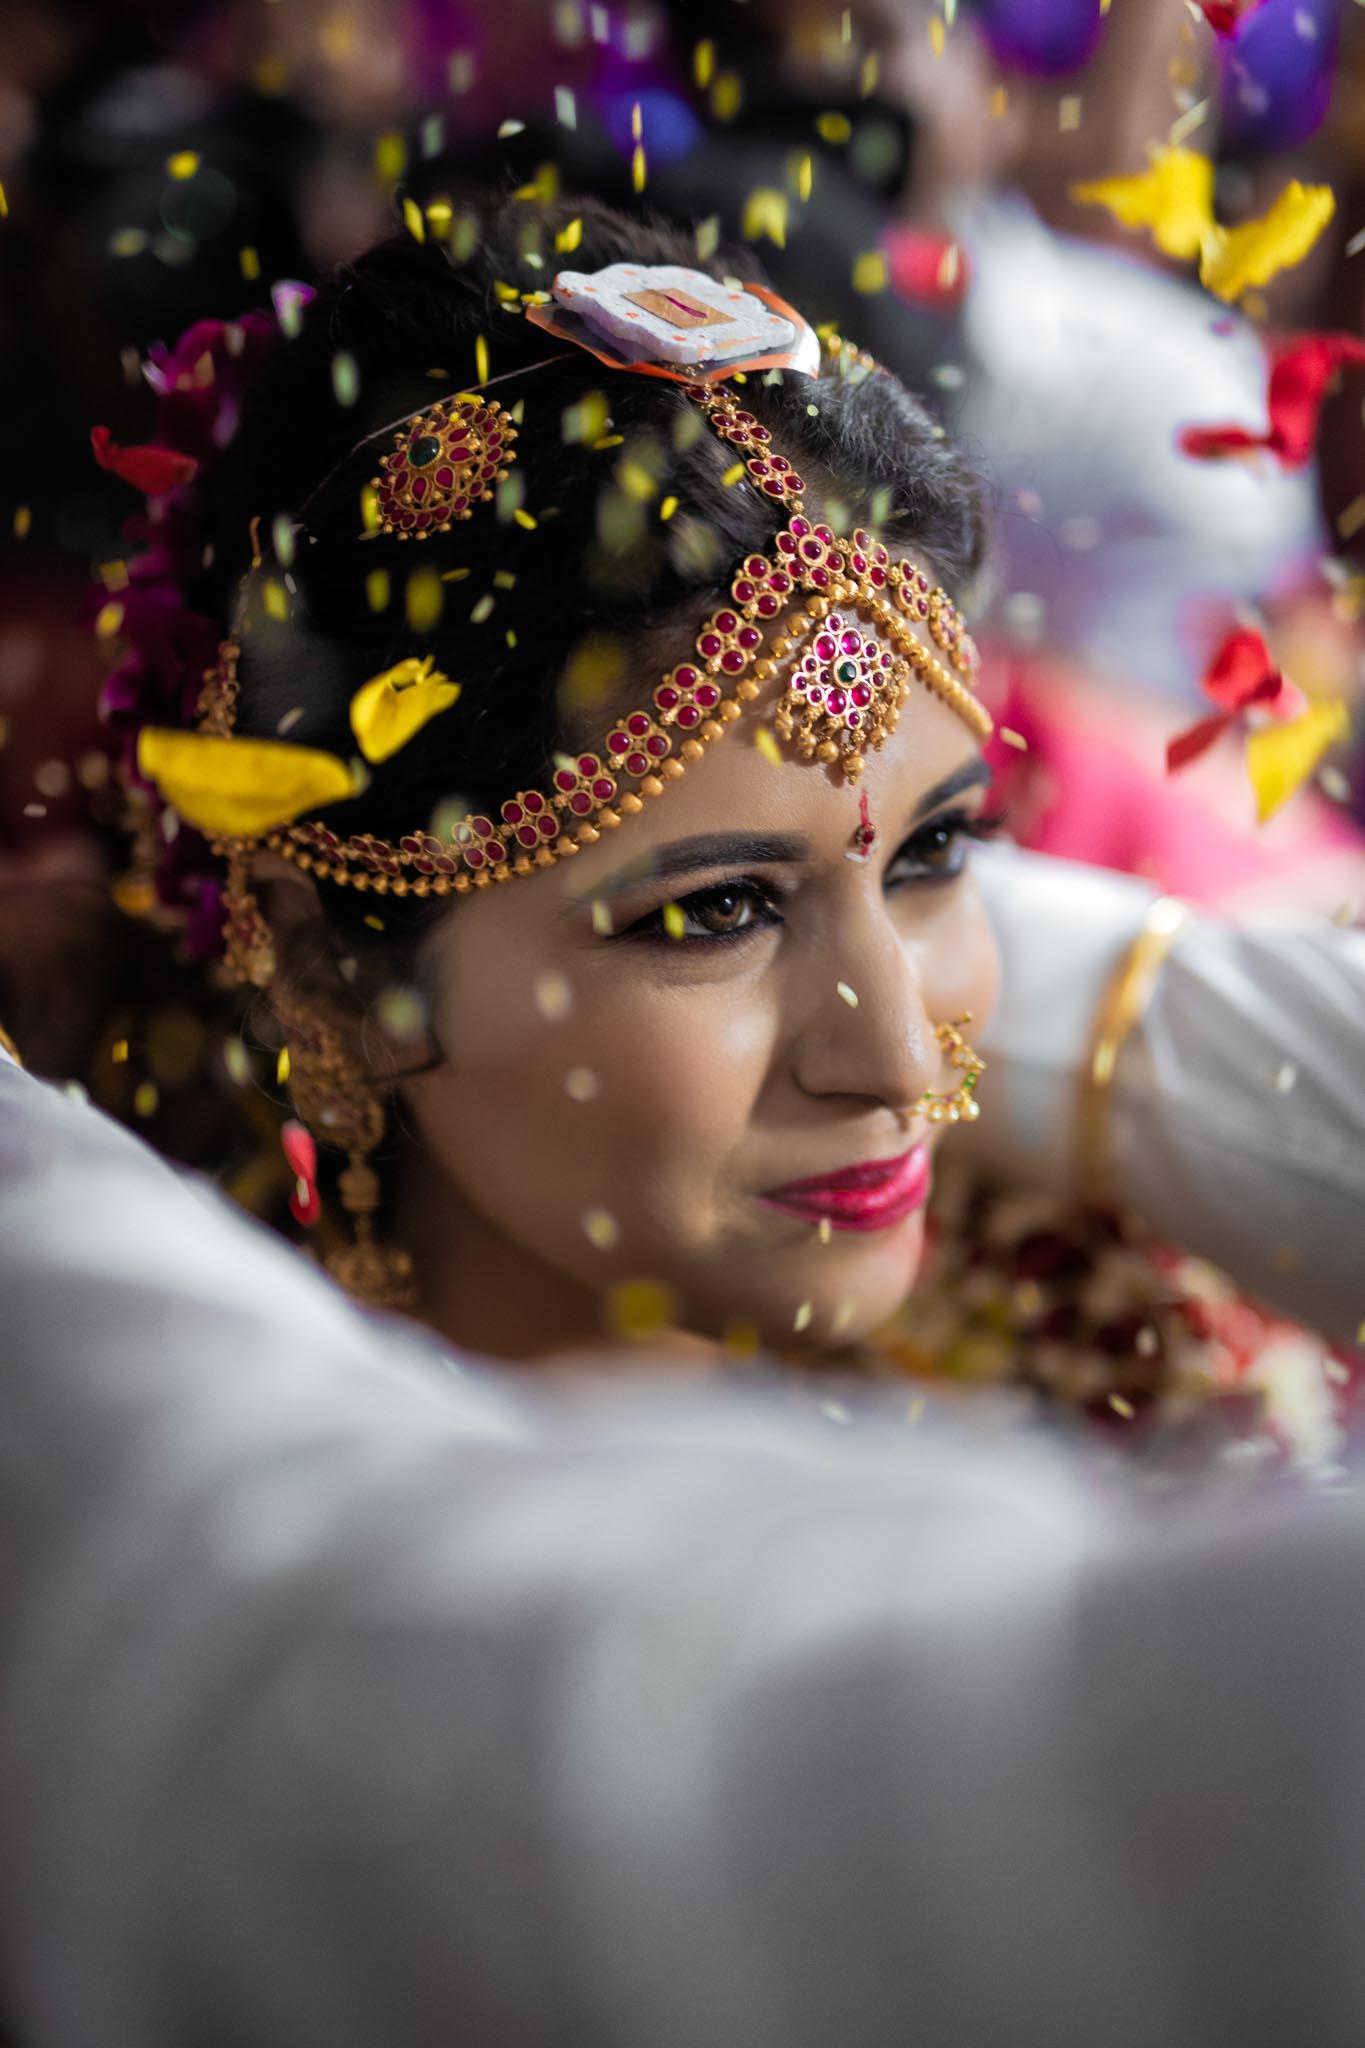 Best-of-2018-wedding-photography-focuz-studios-37